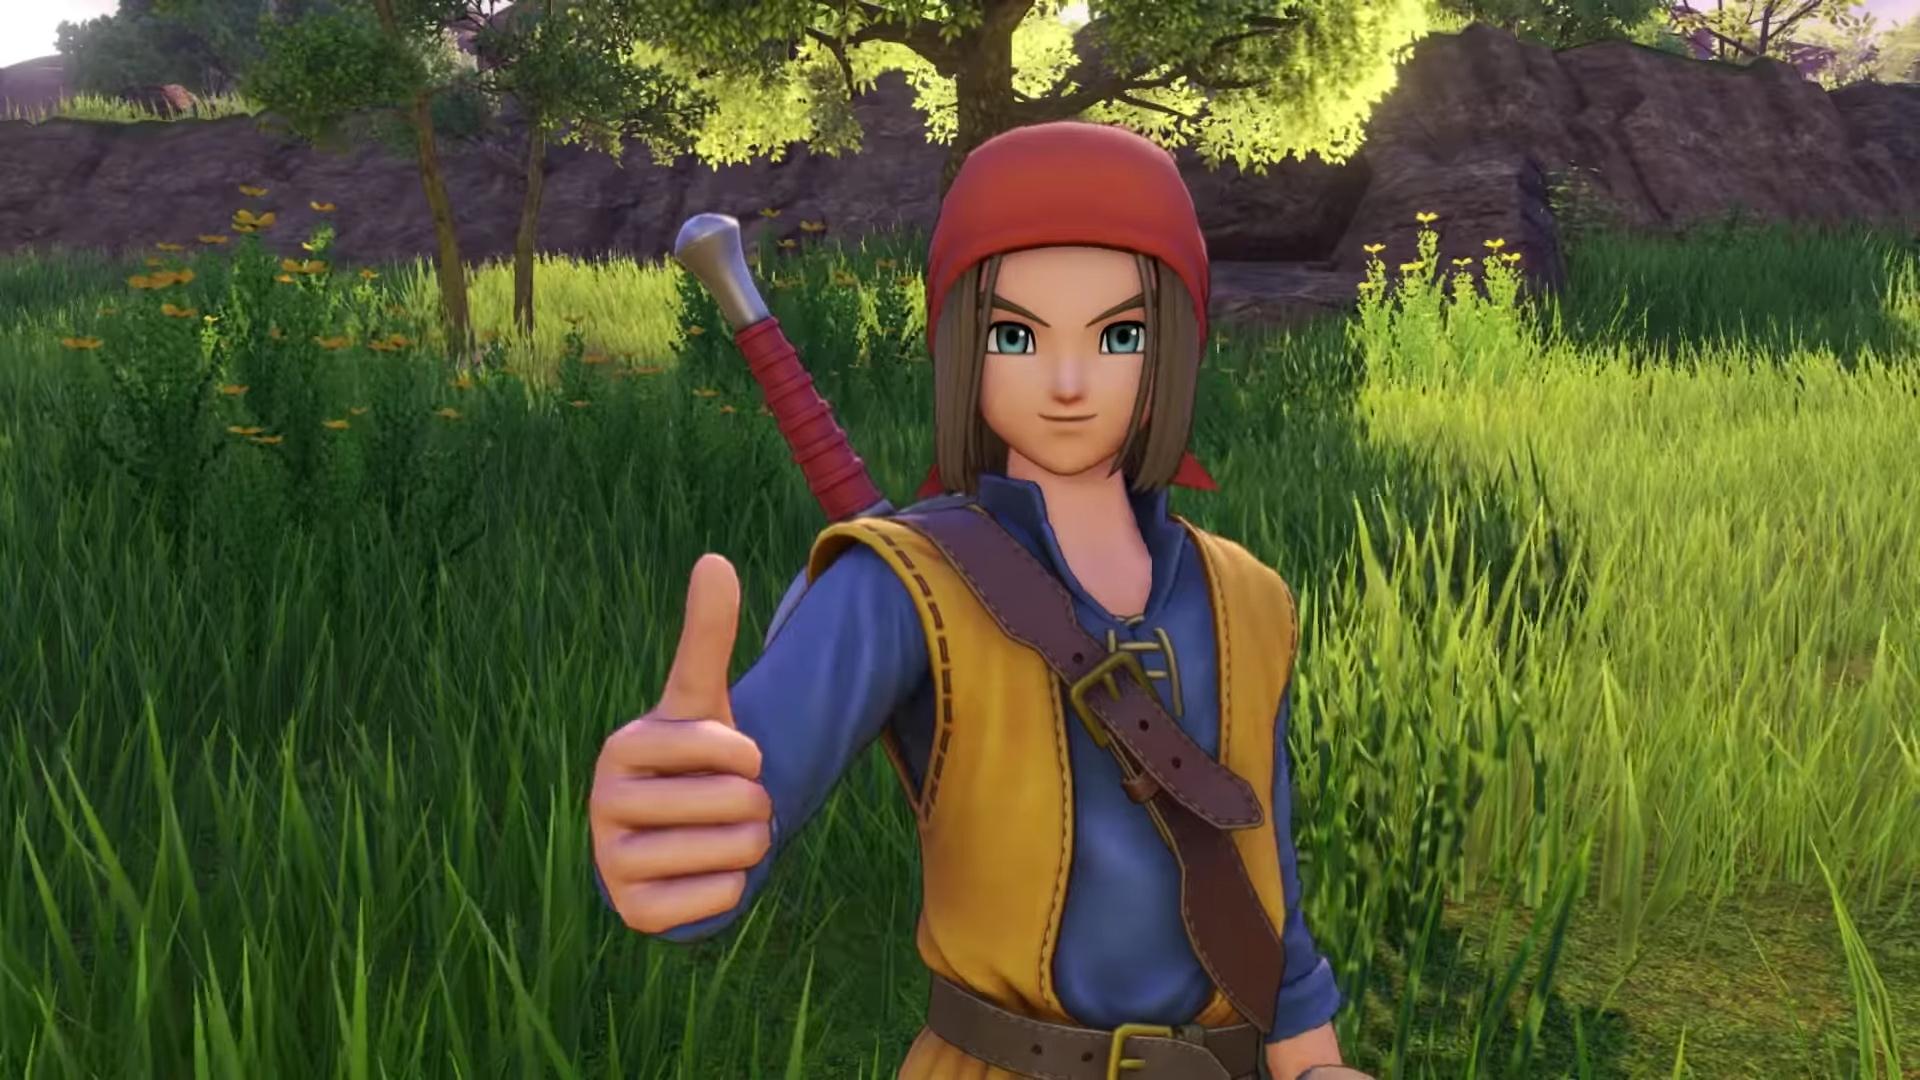 You can swap to a classic costume in Dragon Quest XI screenshot